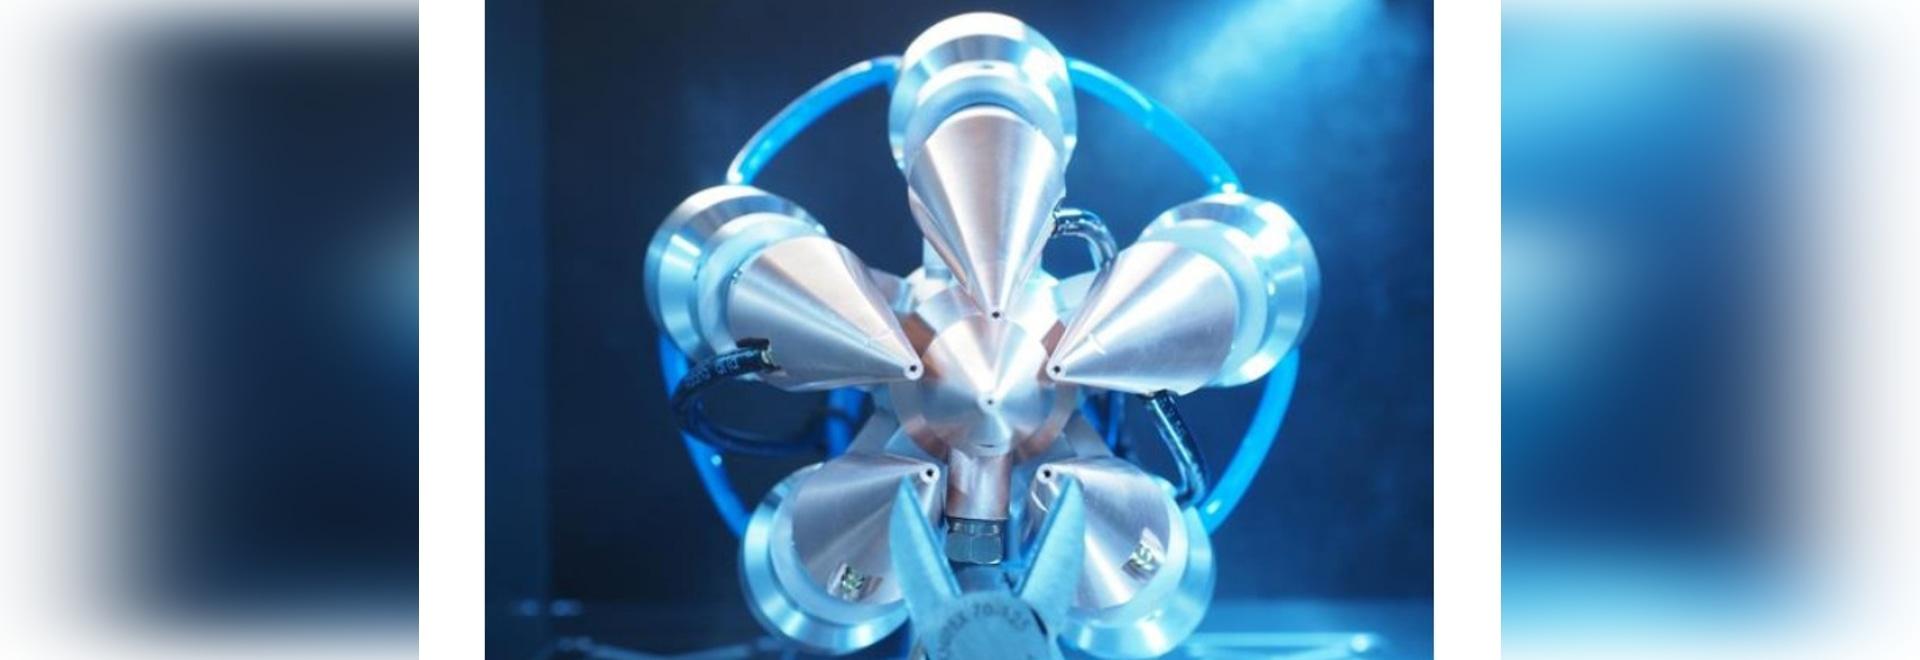 Additec gibt Drucker uPrinter Tischplattenmetall 3D frei